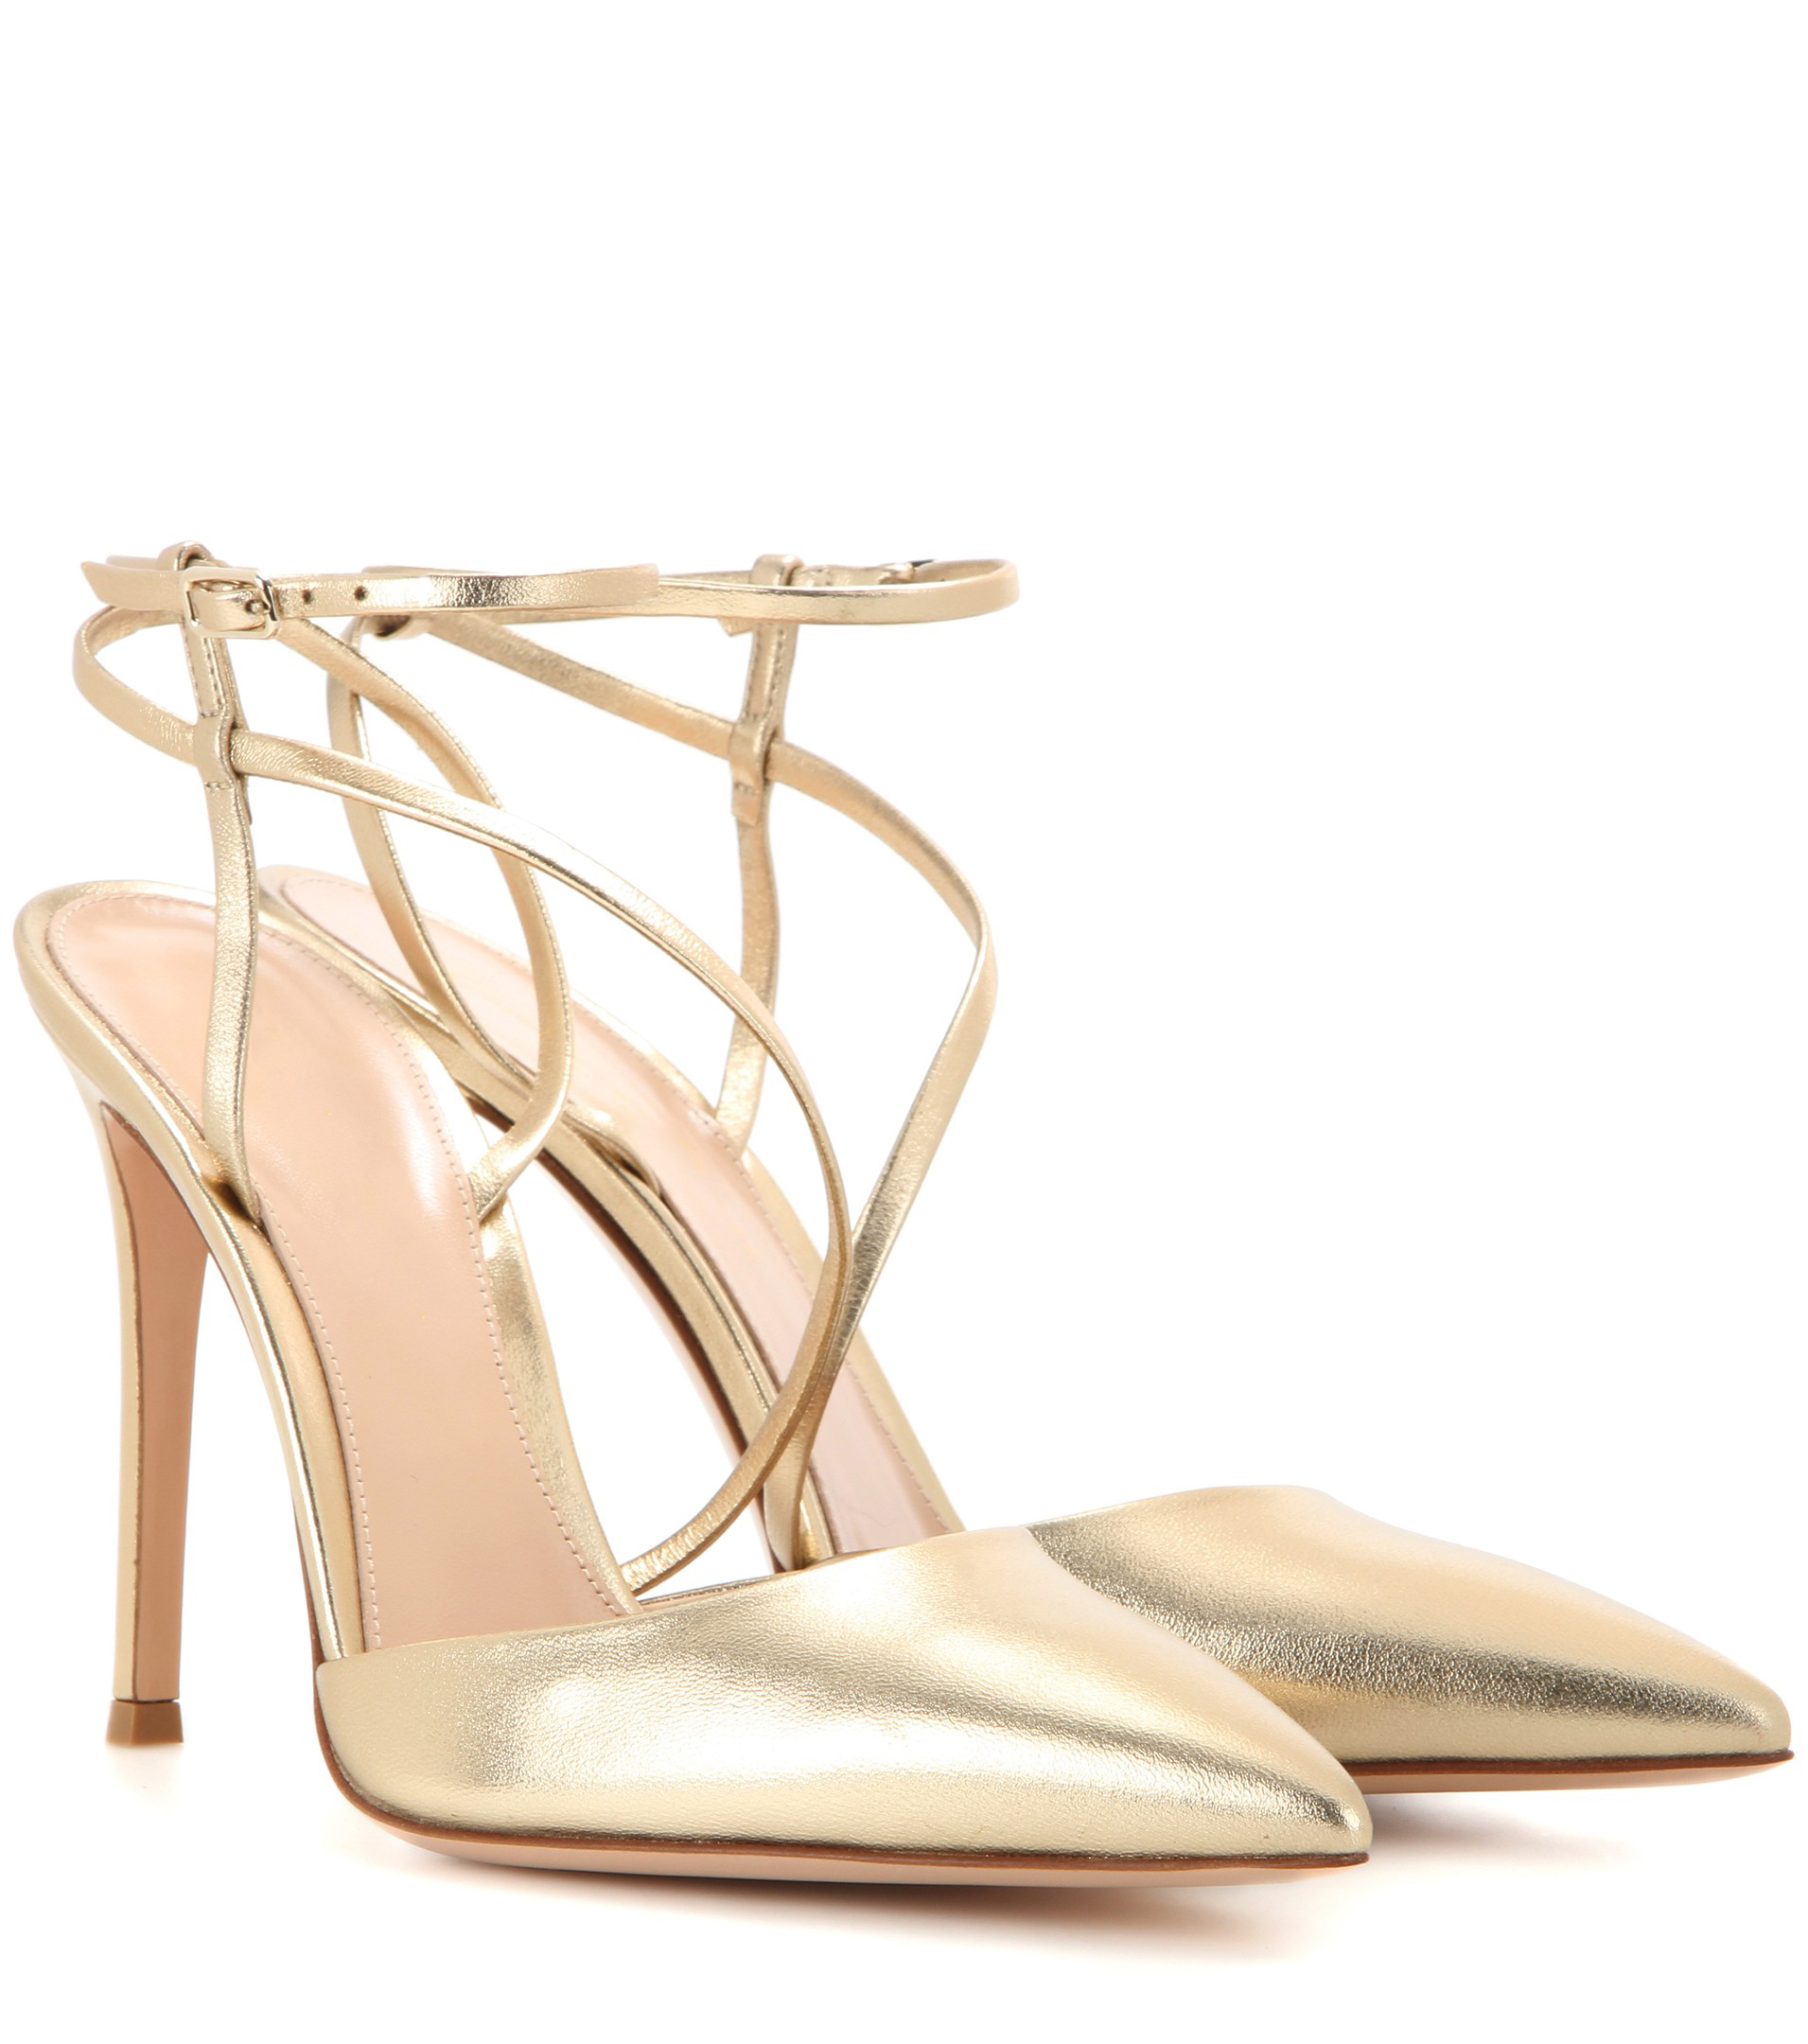 2869b59590df Metallic gold stiletto girls high heels fashion high quality slingback  pointed toe ladies shoes ...